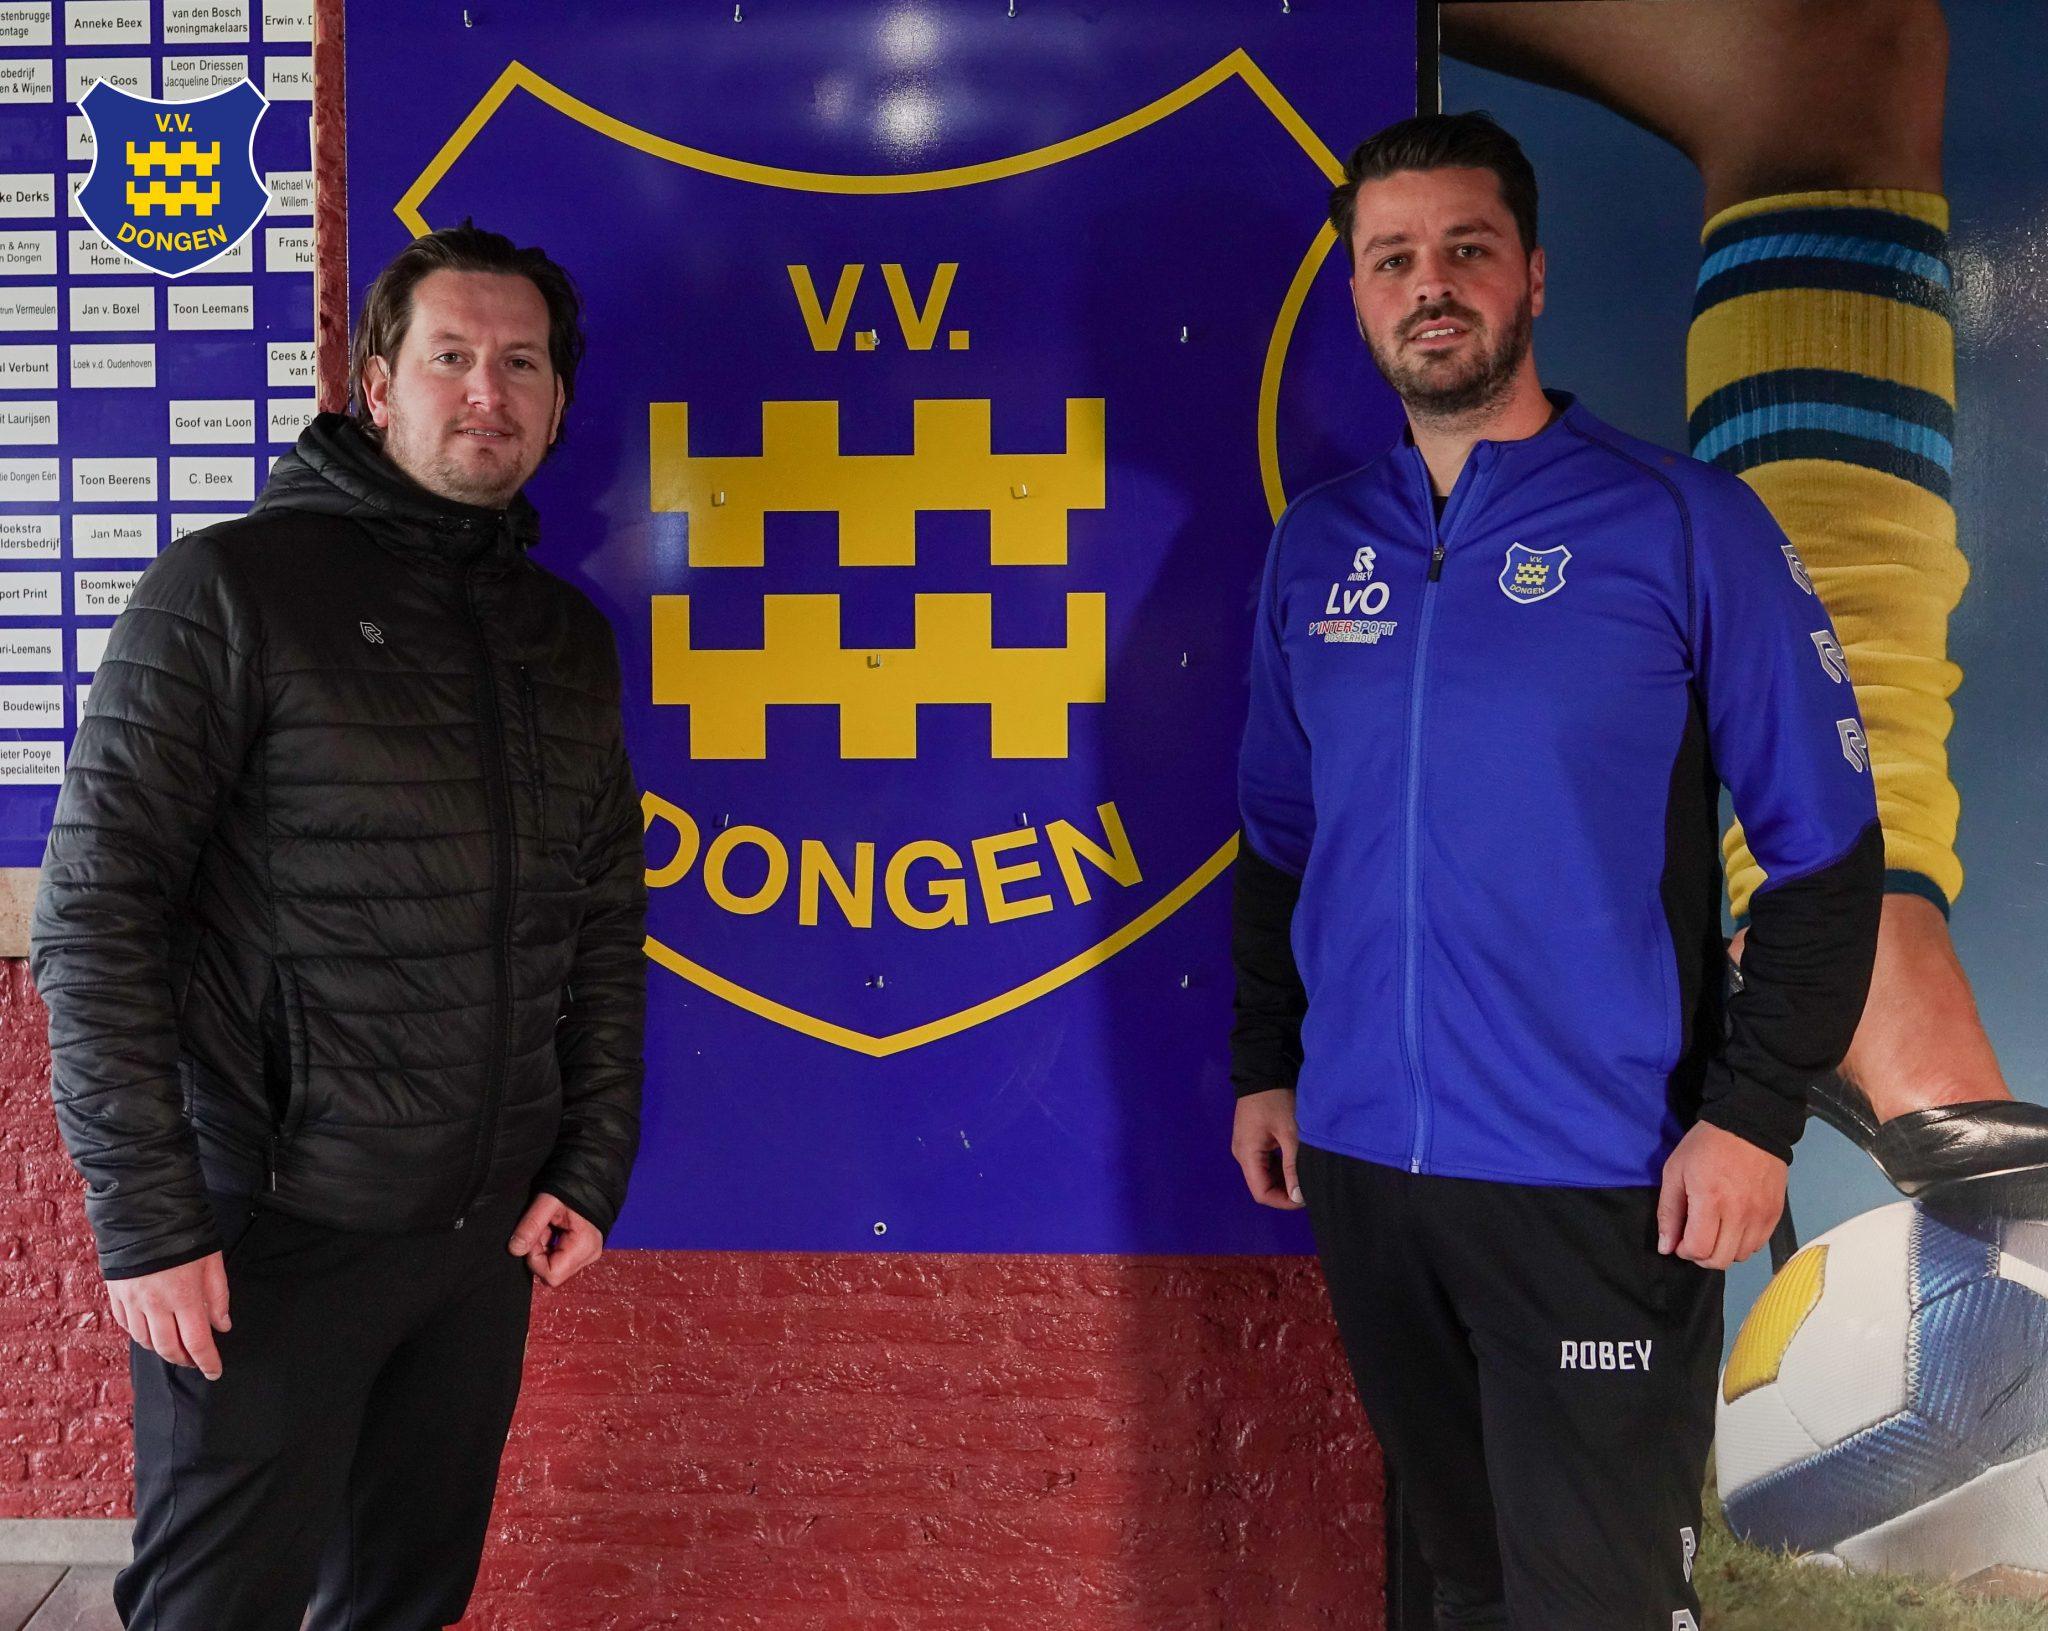 WO events organiseren Internationaal jeugdtoernooi bij VV Dongen